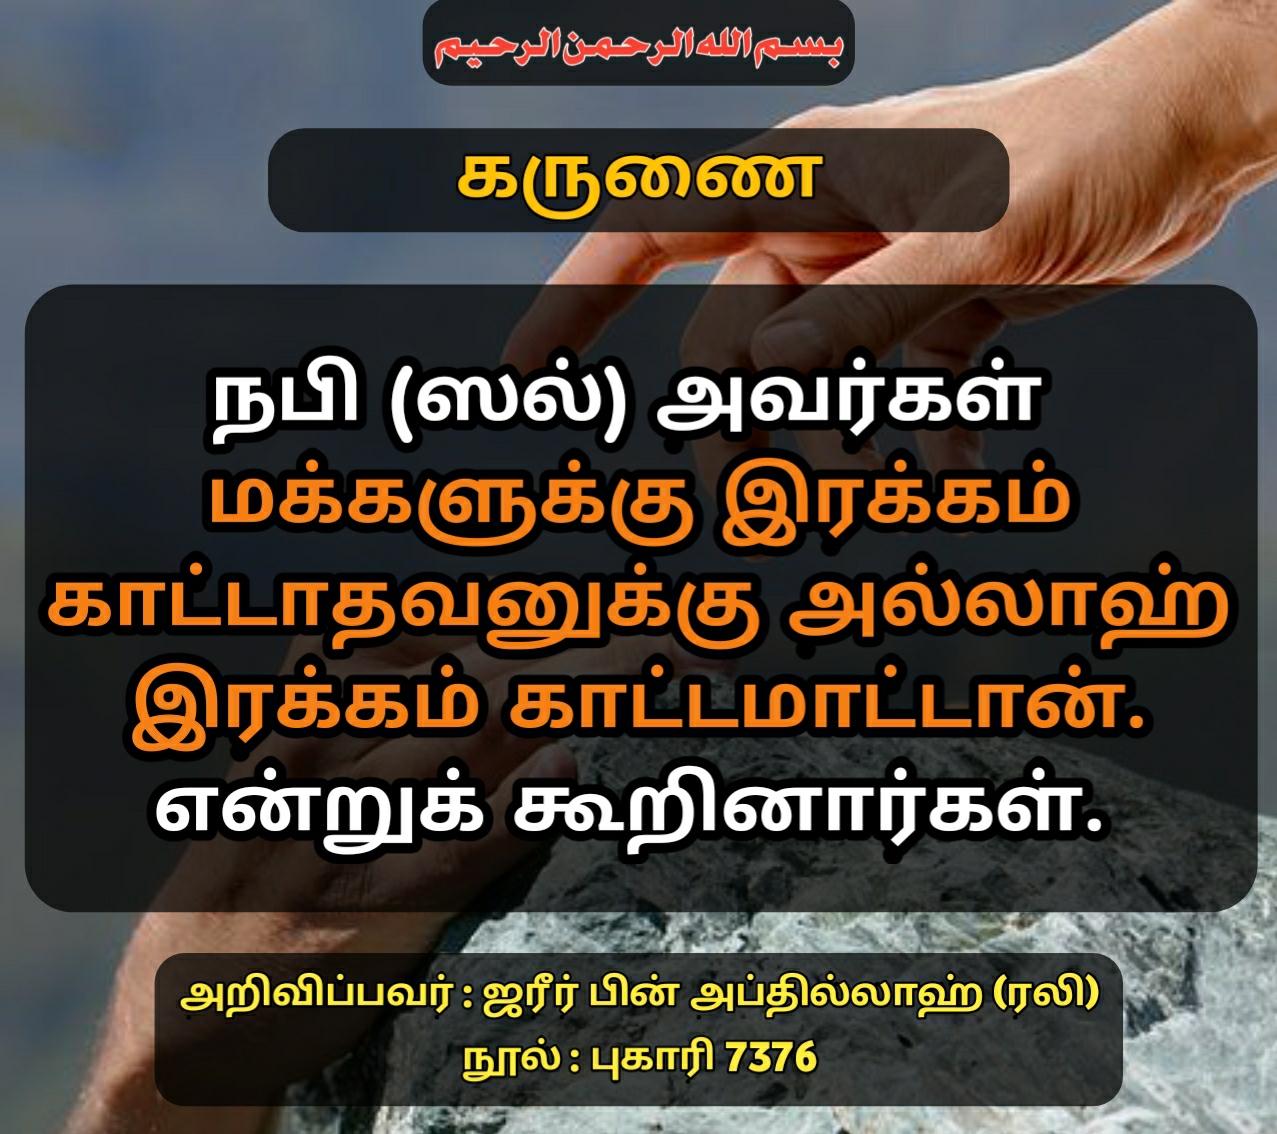 https://www.tamilislamicquotes.com/muhammad-nabi/